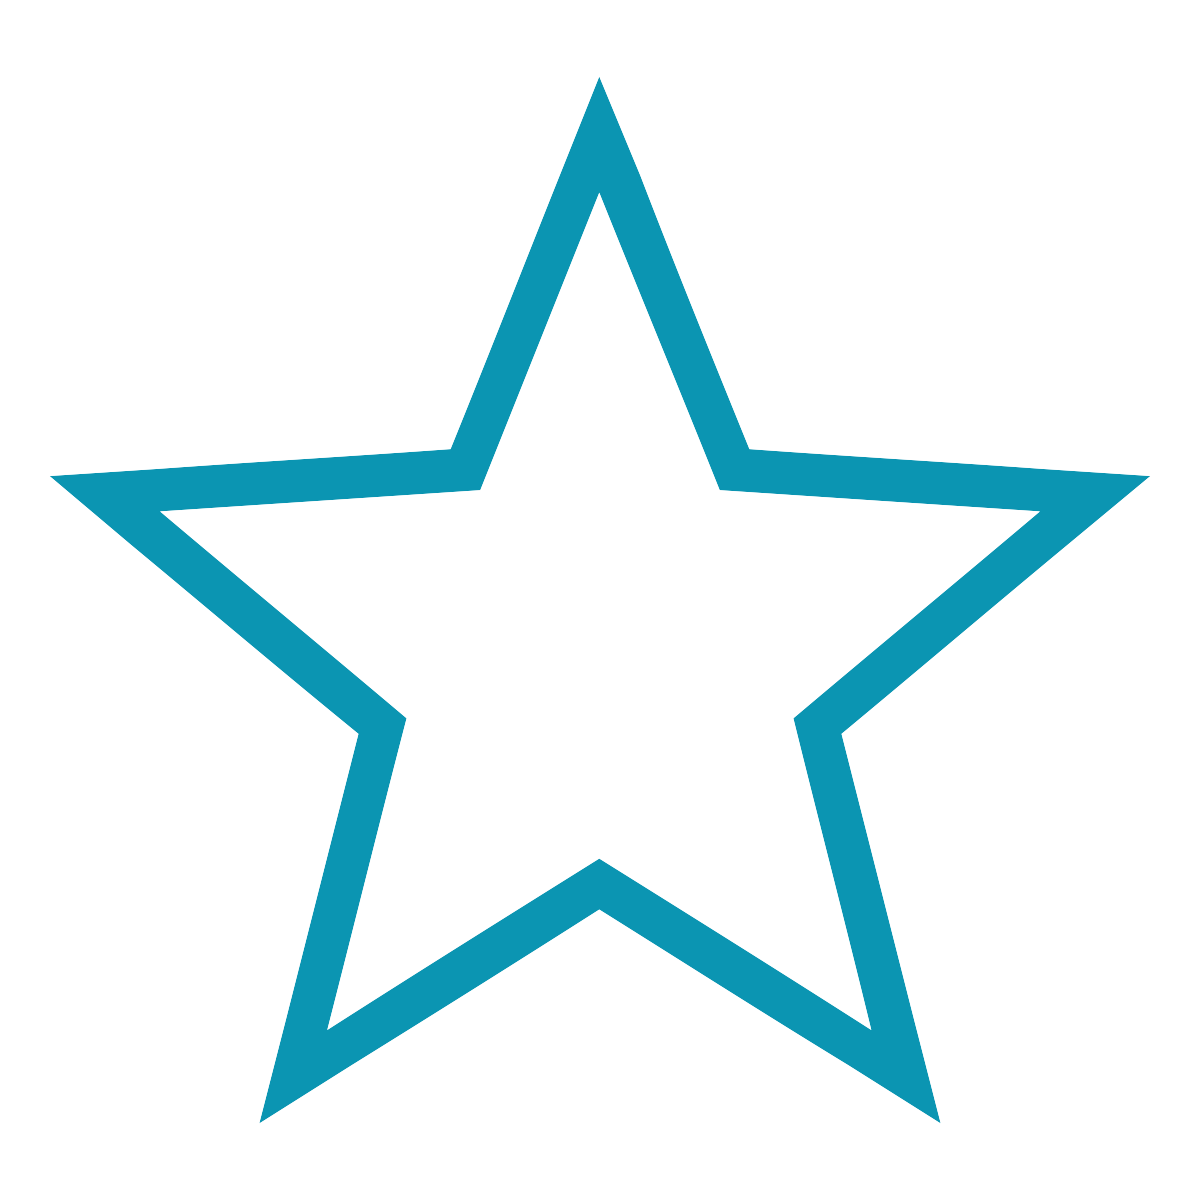 noun_Star_1993624_0b95b2